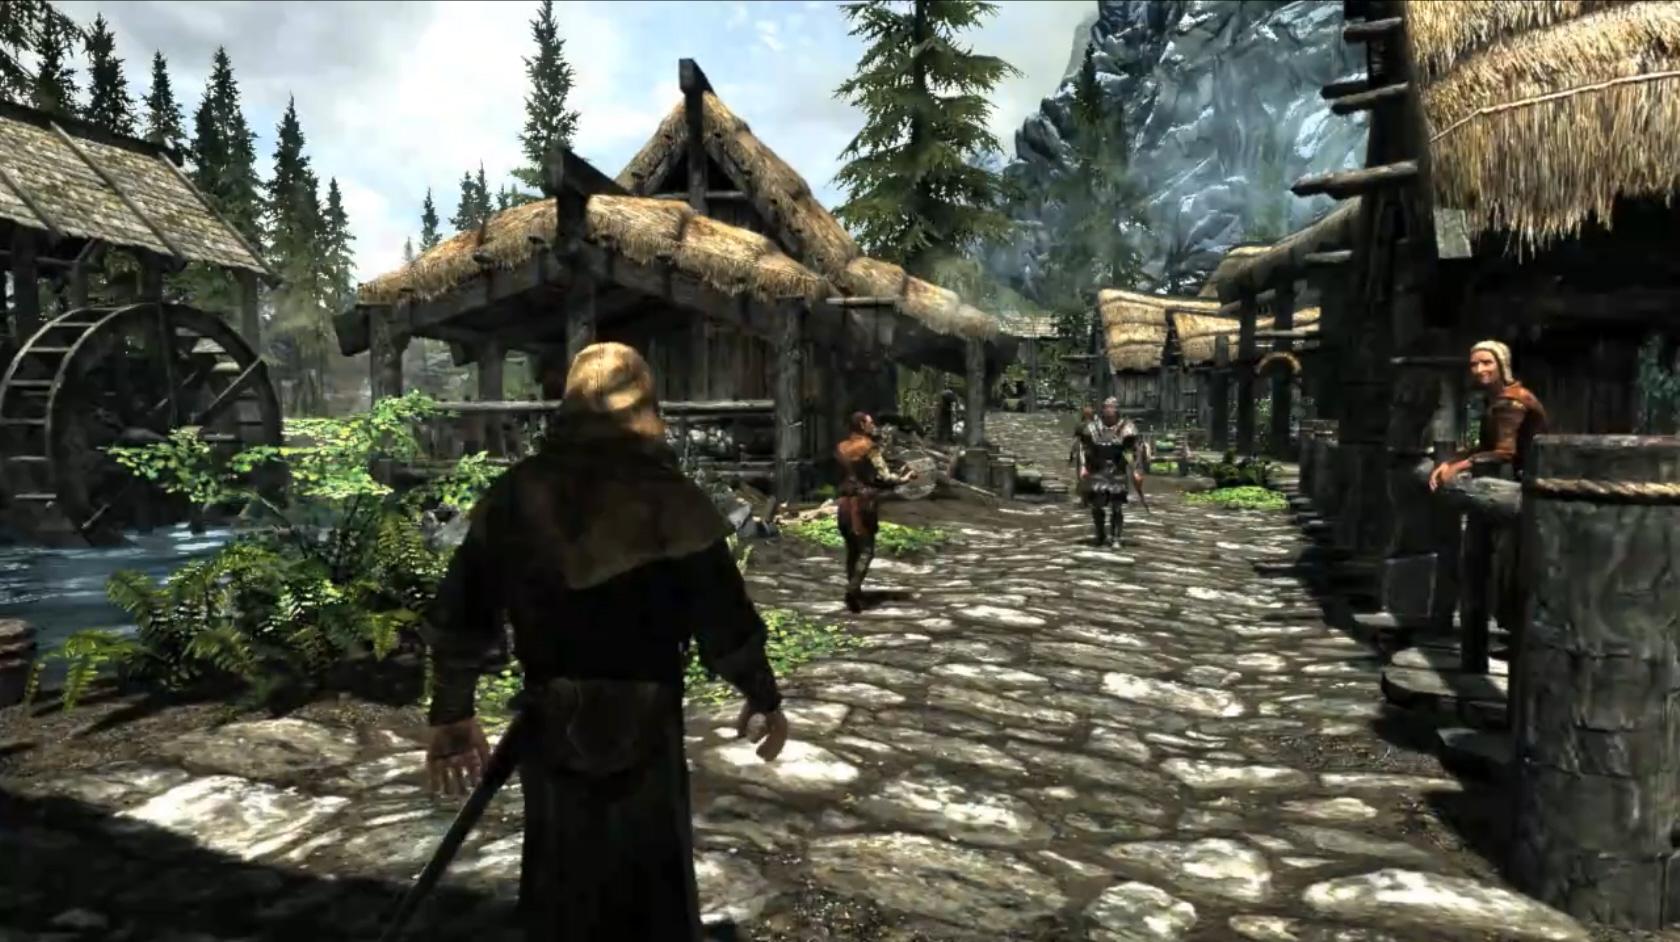 http://www.videogamesblogger.com/wp-content/uploads/2011/02/the-elder-scolls-v-skyrim-gameplay-village-screenshot-xbox-360.jpg